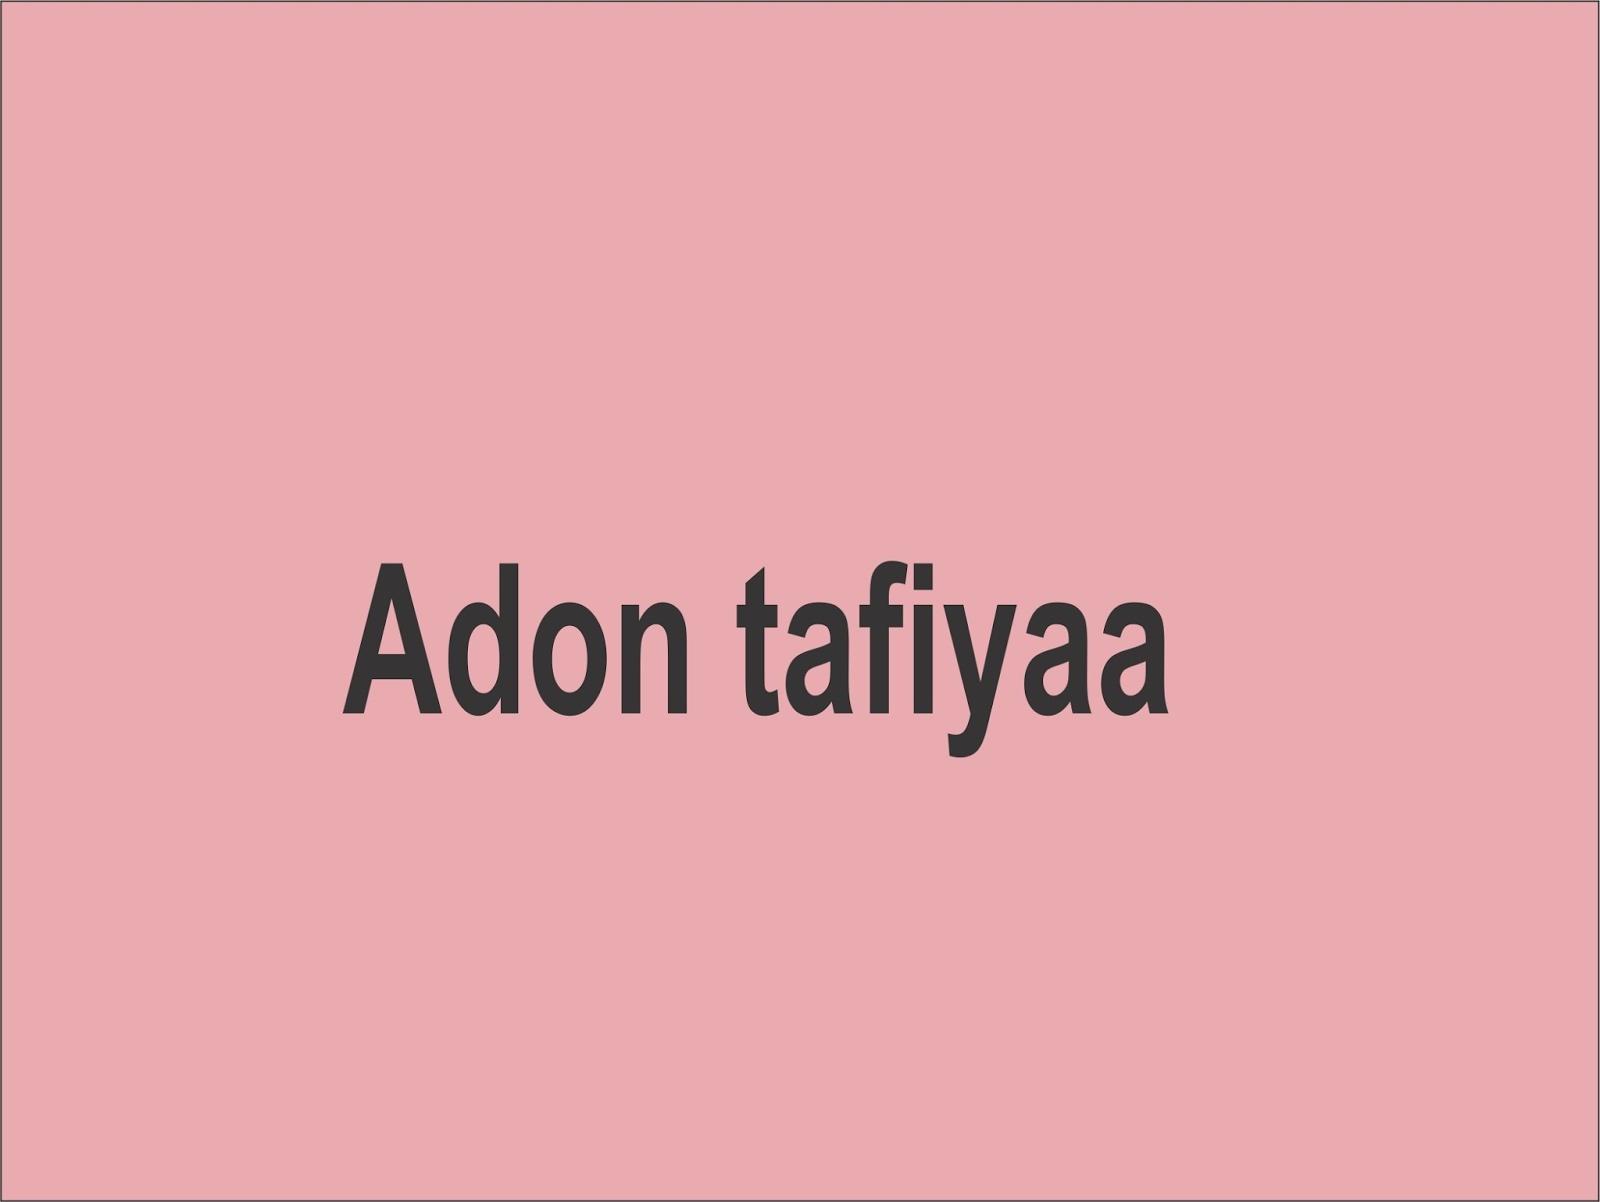 Adon tafiyaa - Gidan Novels | Hausa Novels